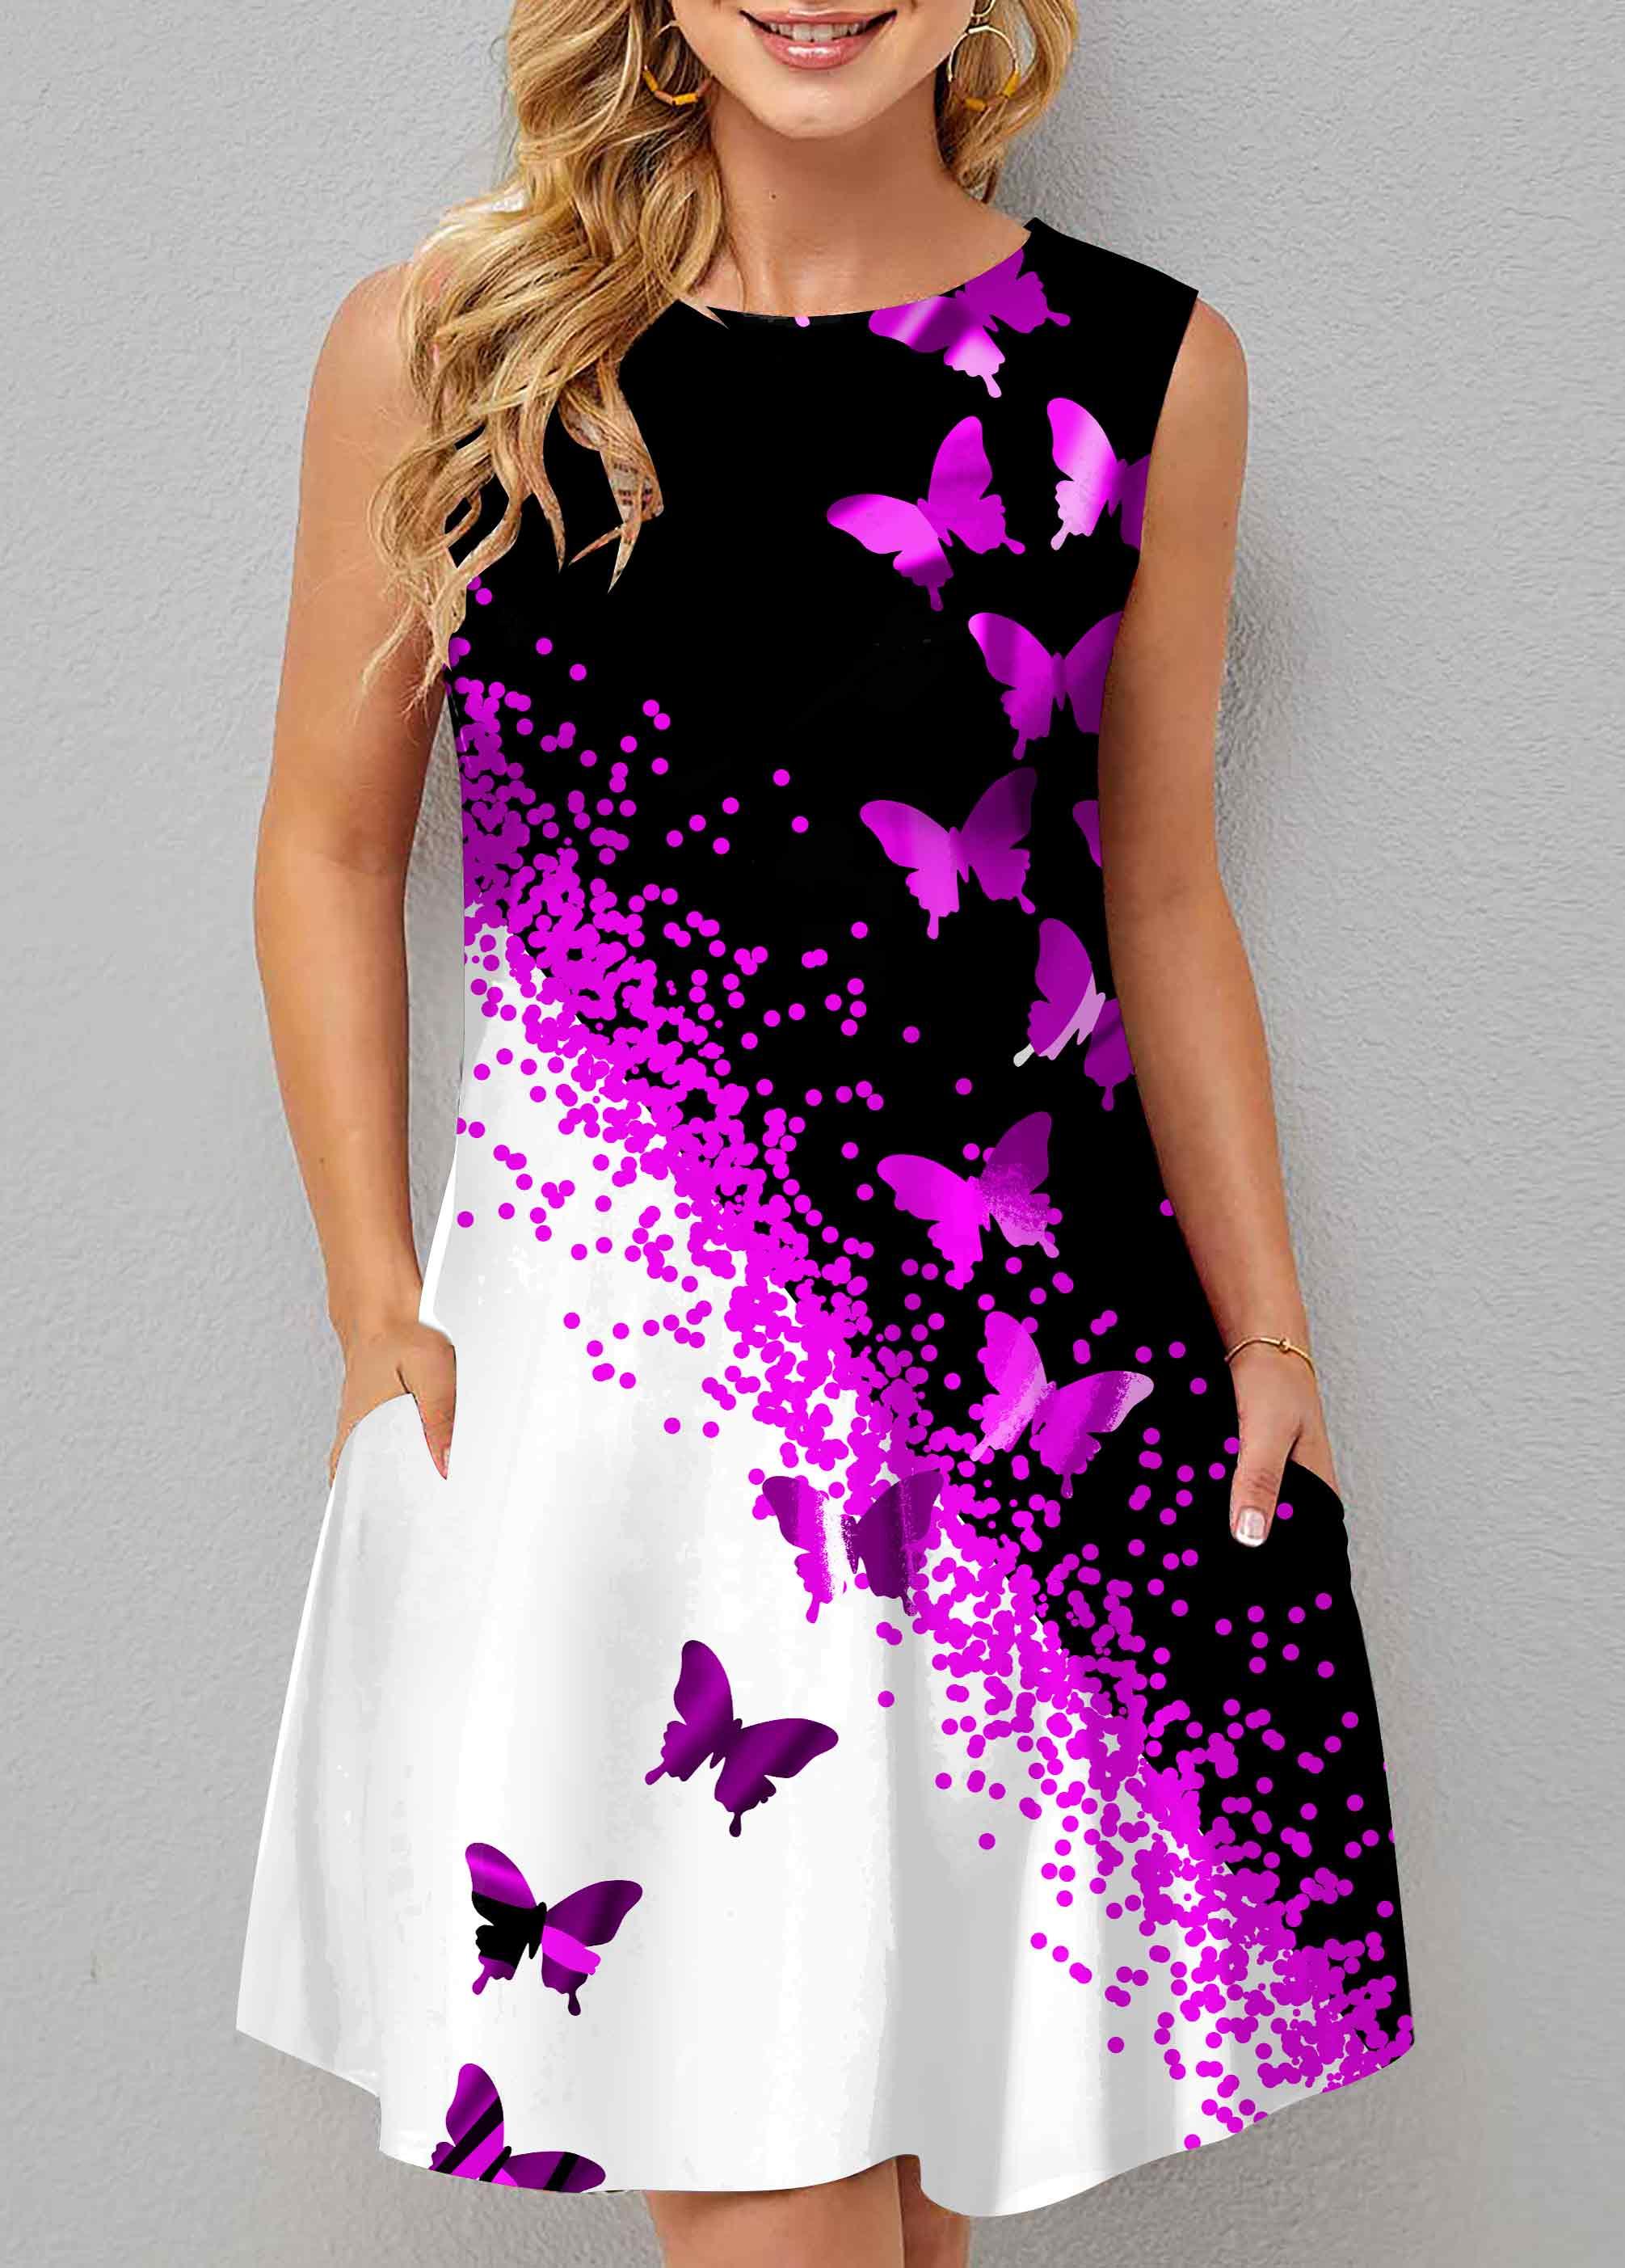 Butterfly Print Double Pocket Contrast Dress